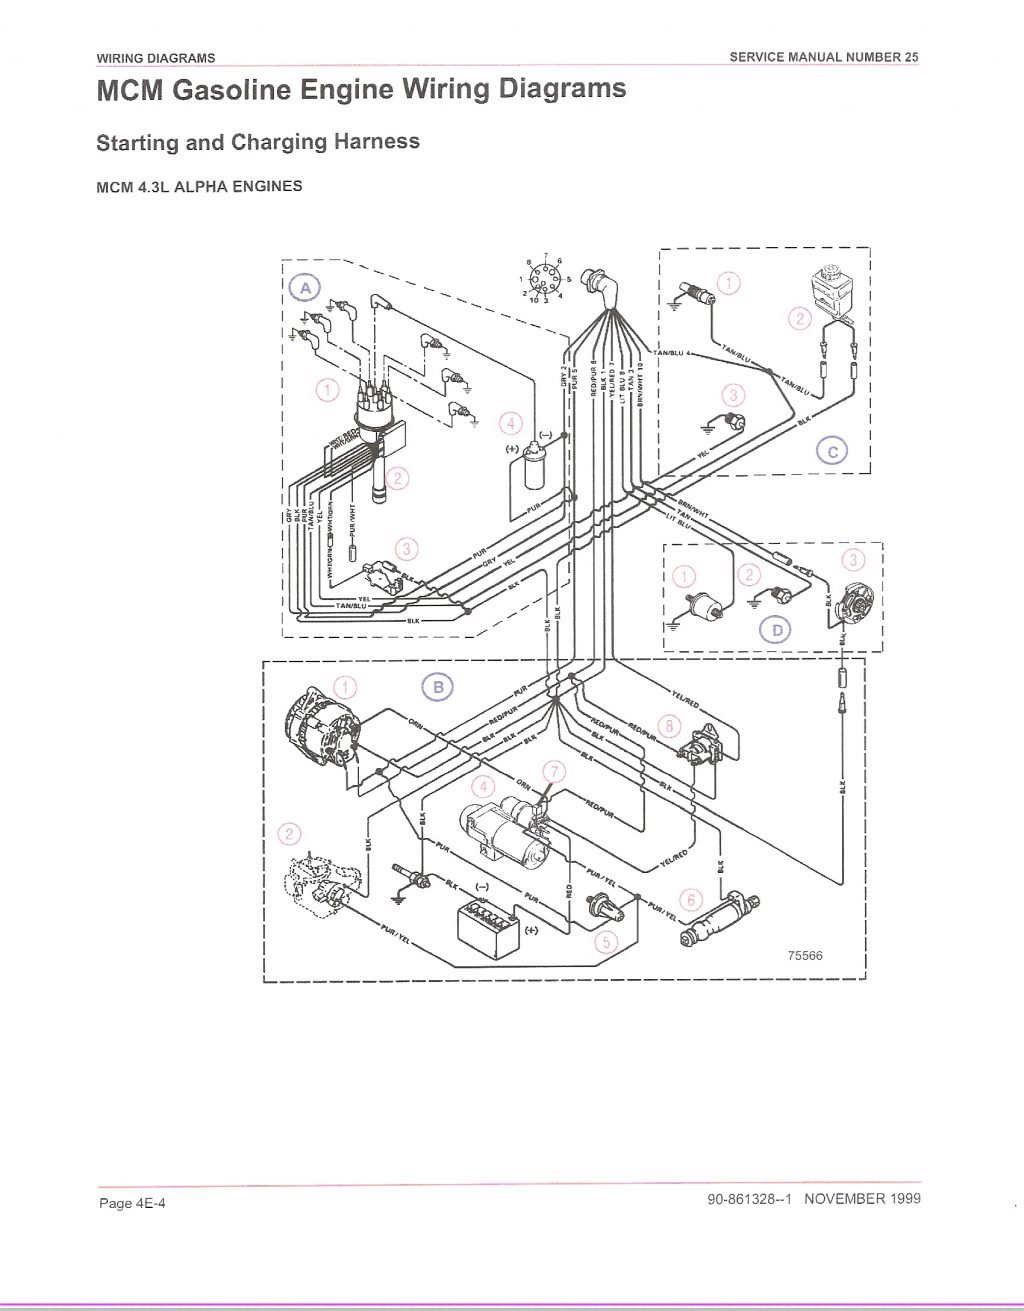 Refrigerator Wiring Diagram Engine Wiring Diagram Image On Whirlpool